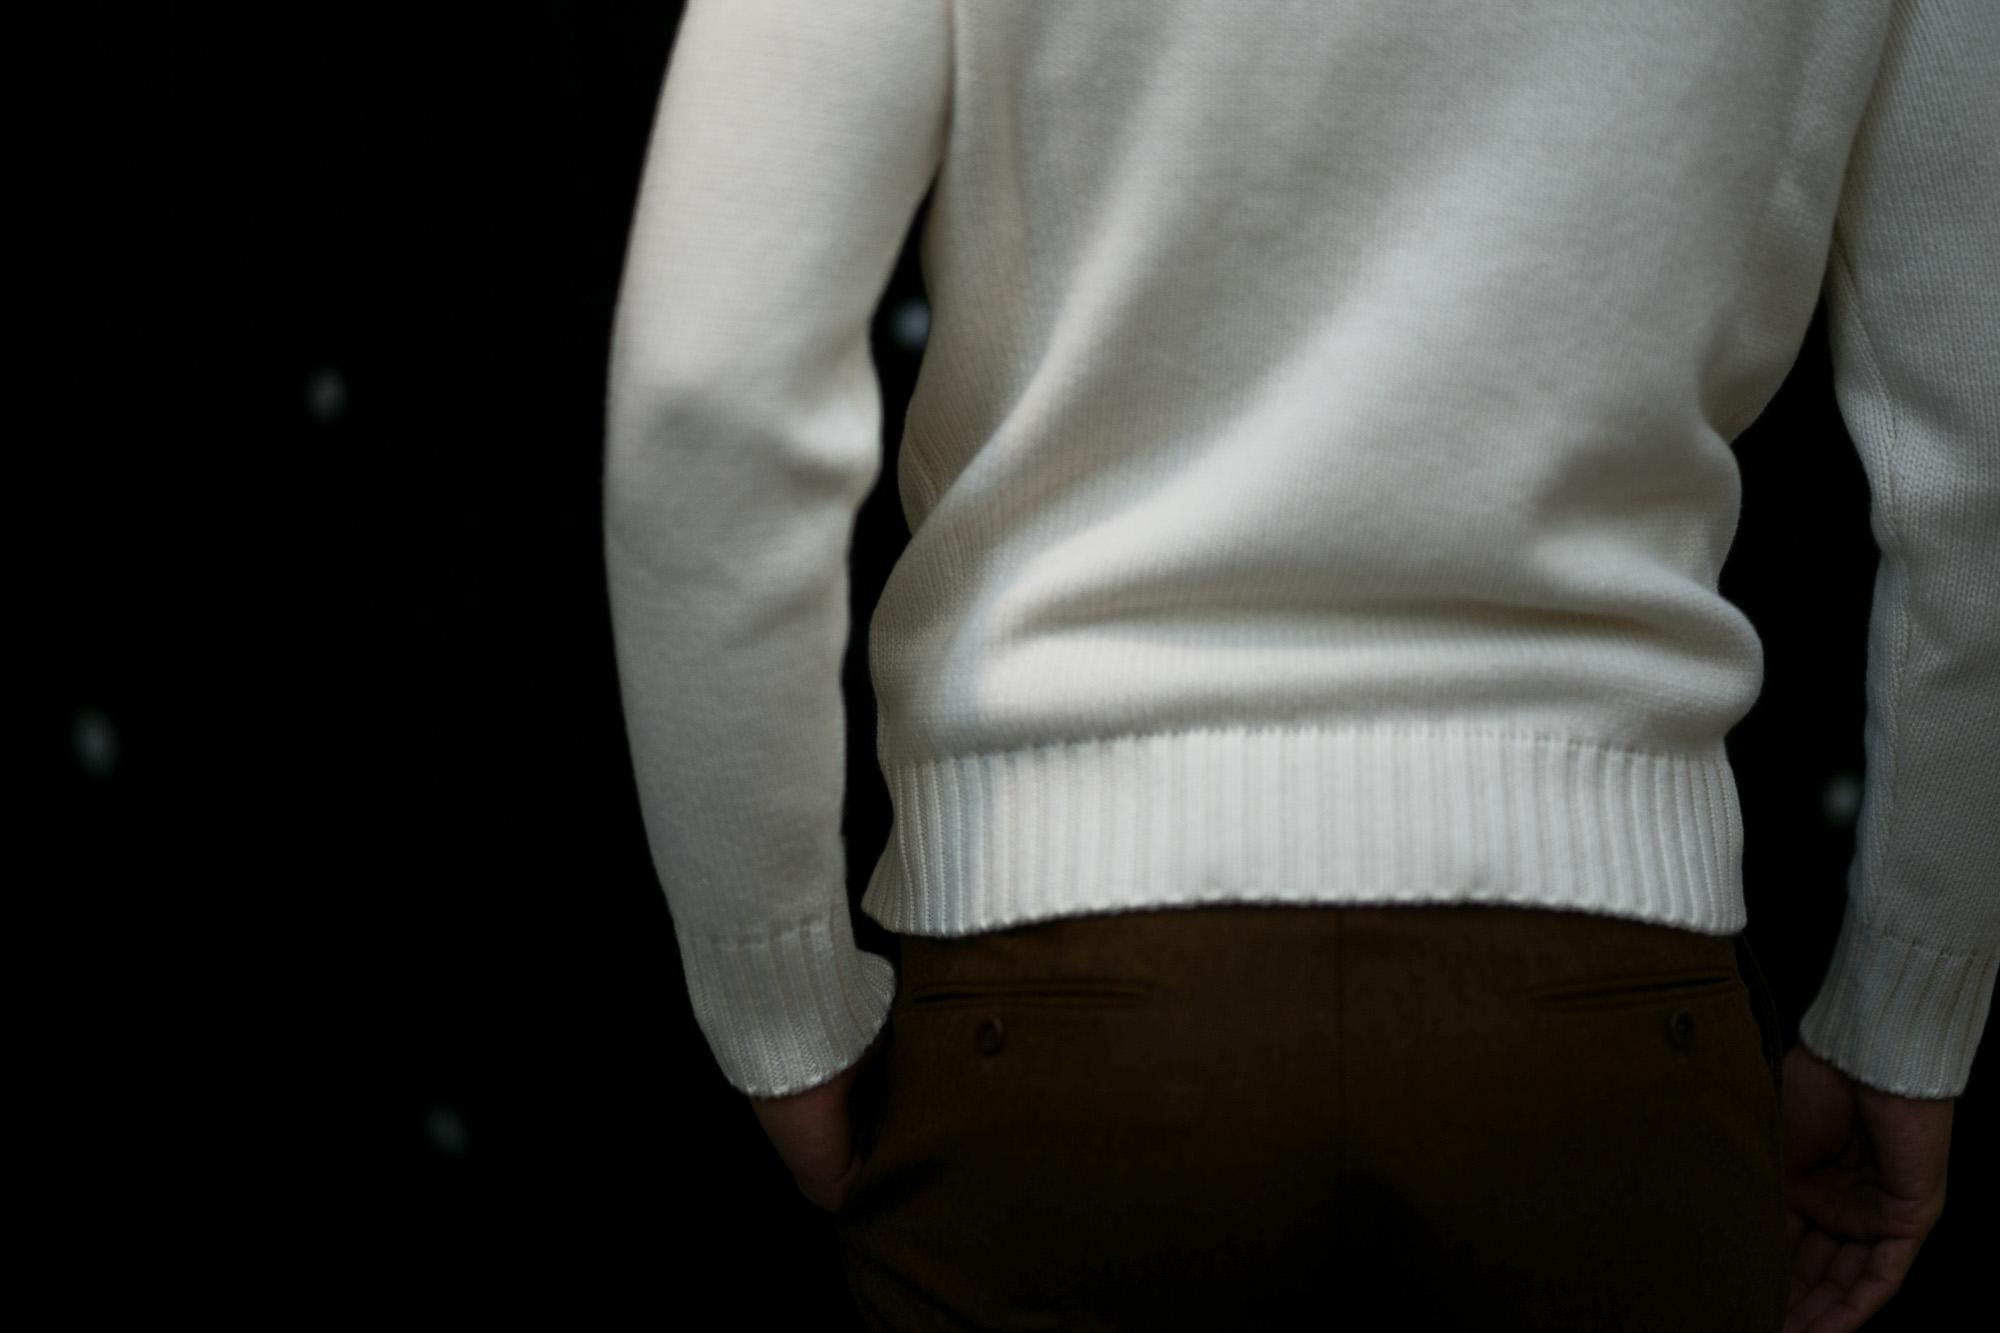 ZANONE (ザノーネ) Cashmere Turtle Neck Sweater (カシミア タートルネックセーター) ミドルゲージ カシミア ニット セーター OFF WHITE (オフホワイト・Z4918) made in italy (イタリア製) 2018 秋冬新作 愛知 名古屋 altoediritto アルトエデリット カシミヤ